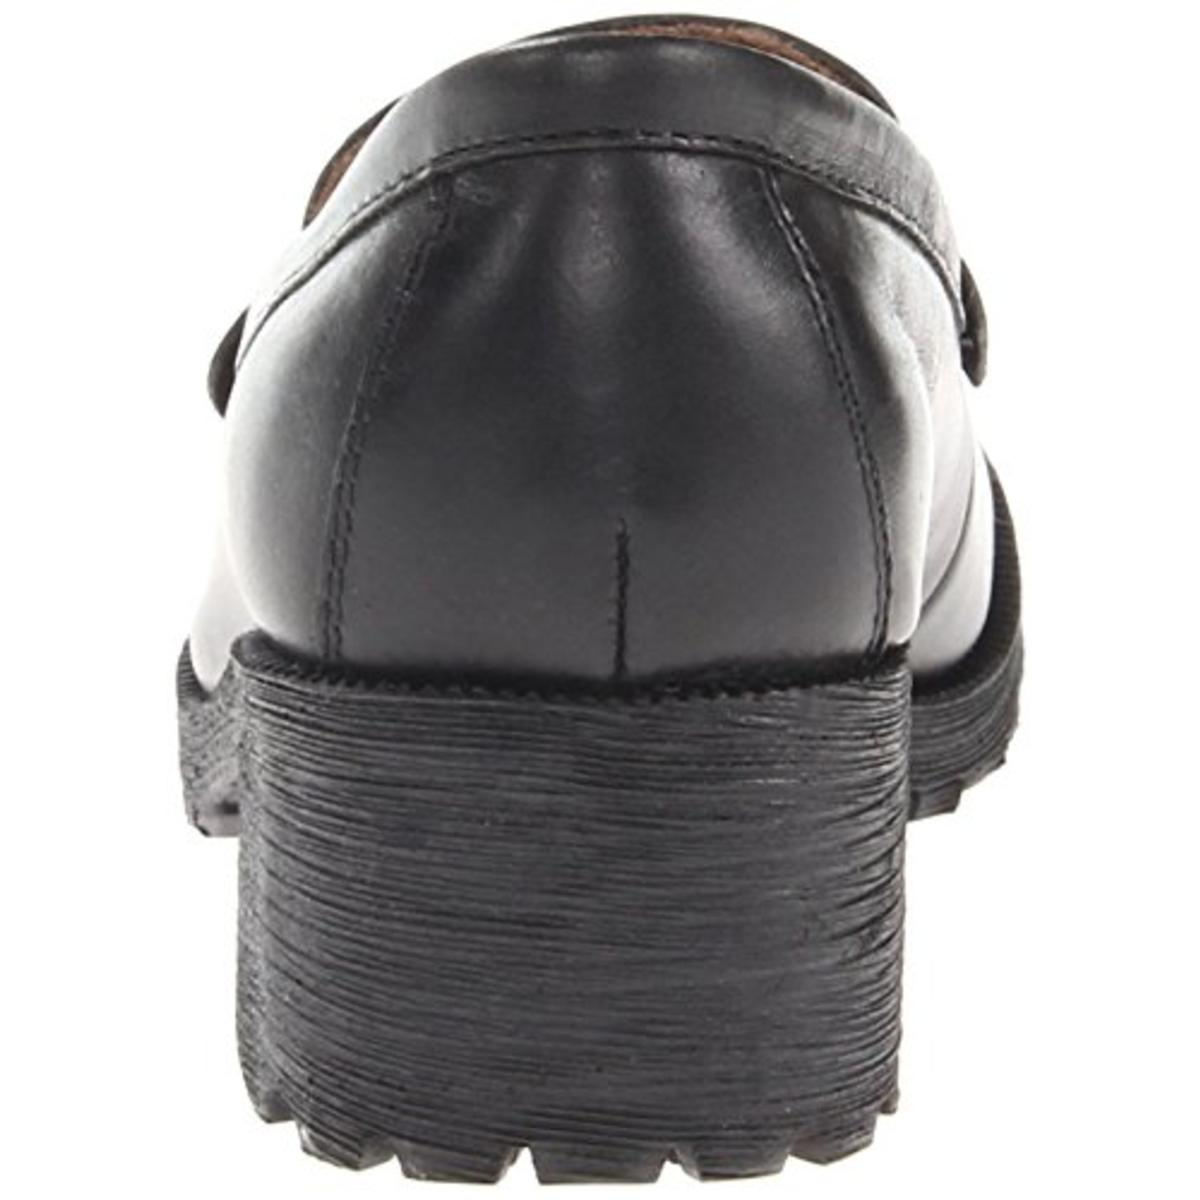 Eastland Womens Newbury Black Clog Penny Loafers Shoes 6 ...